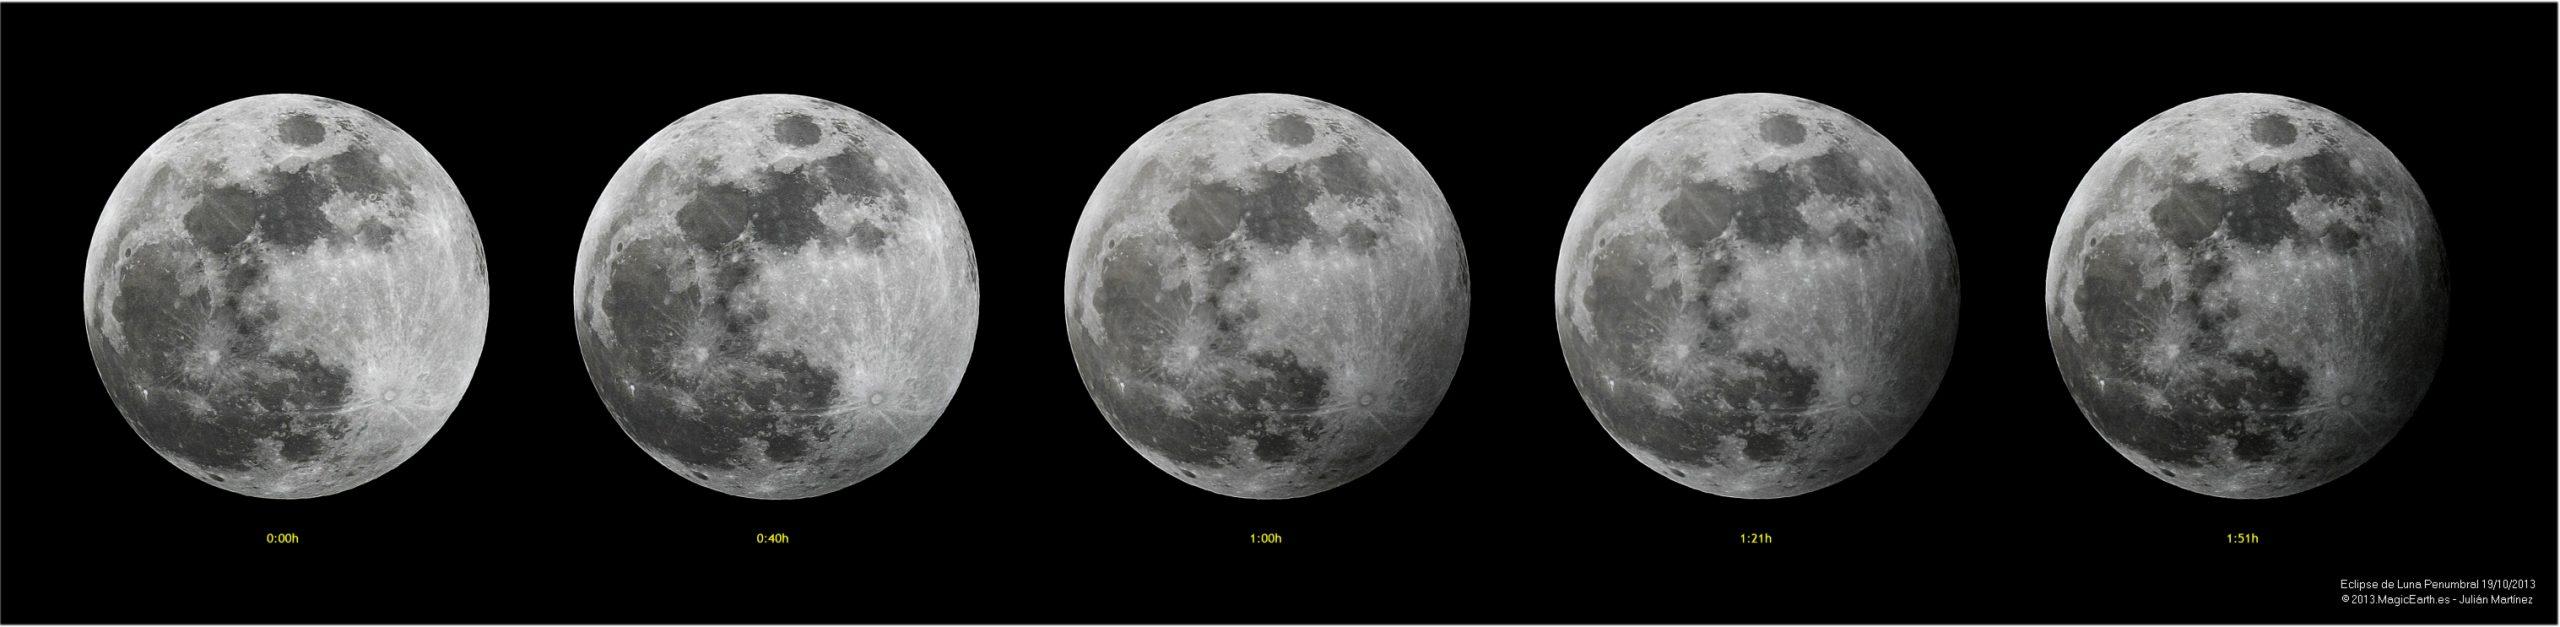 EclipsePenumbral-19102013